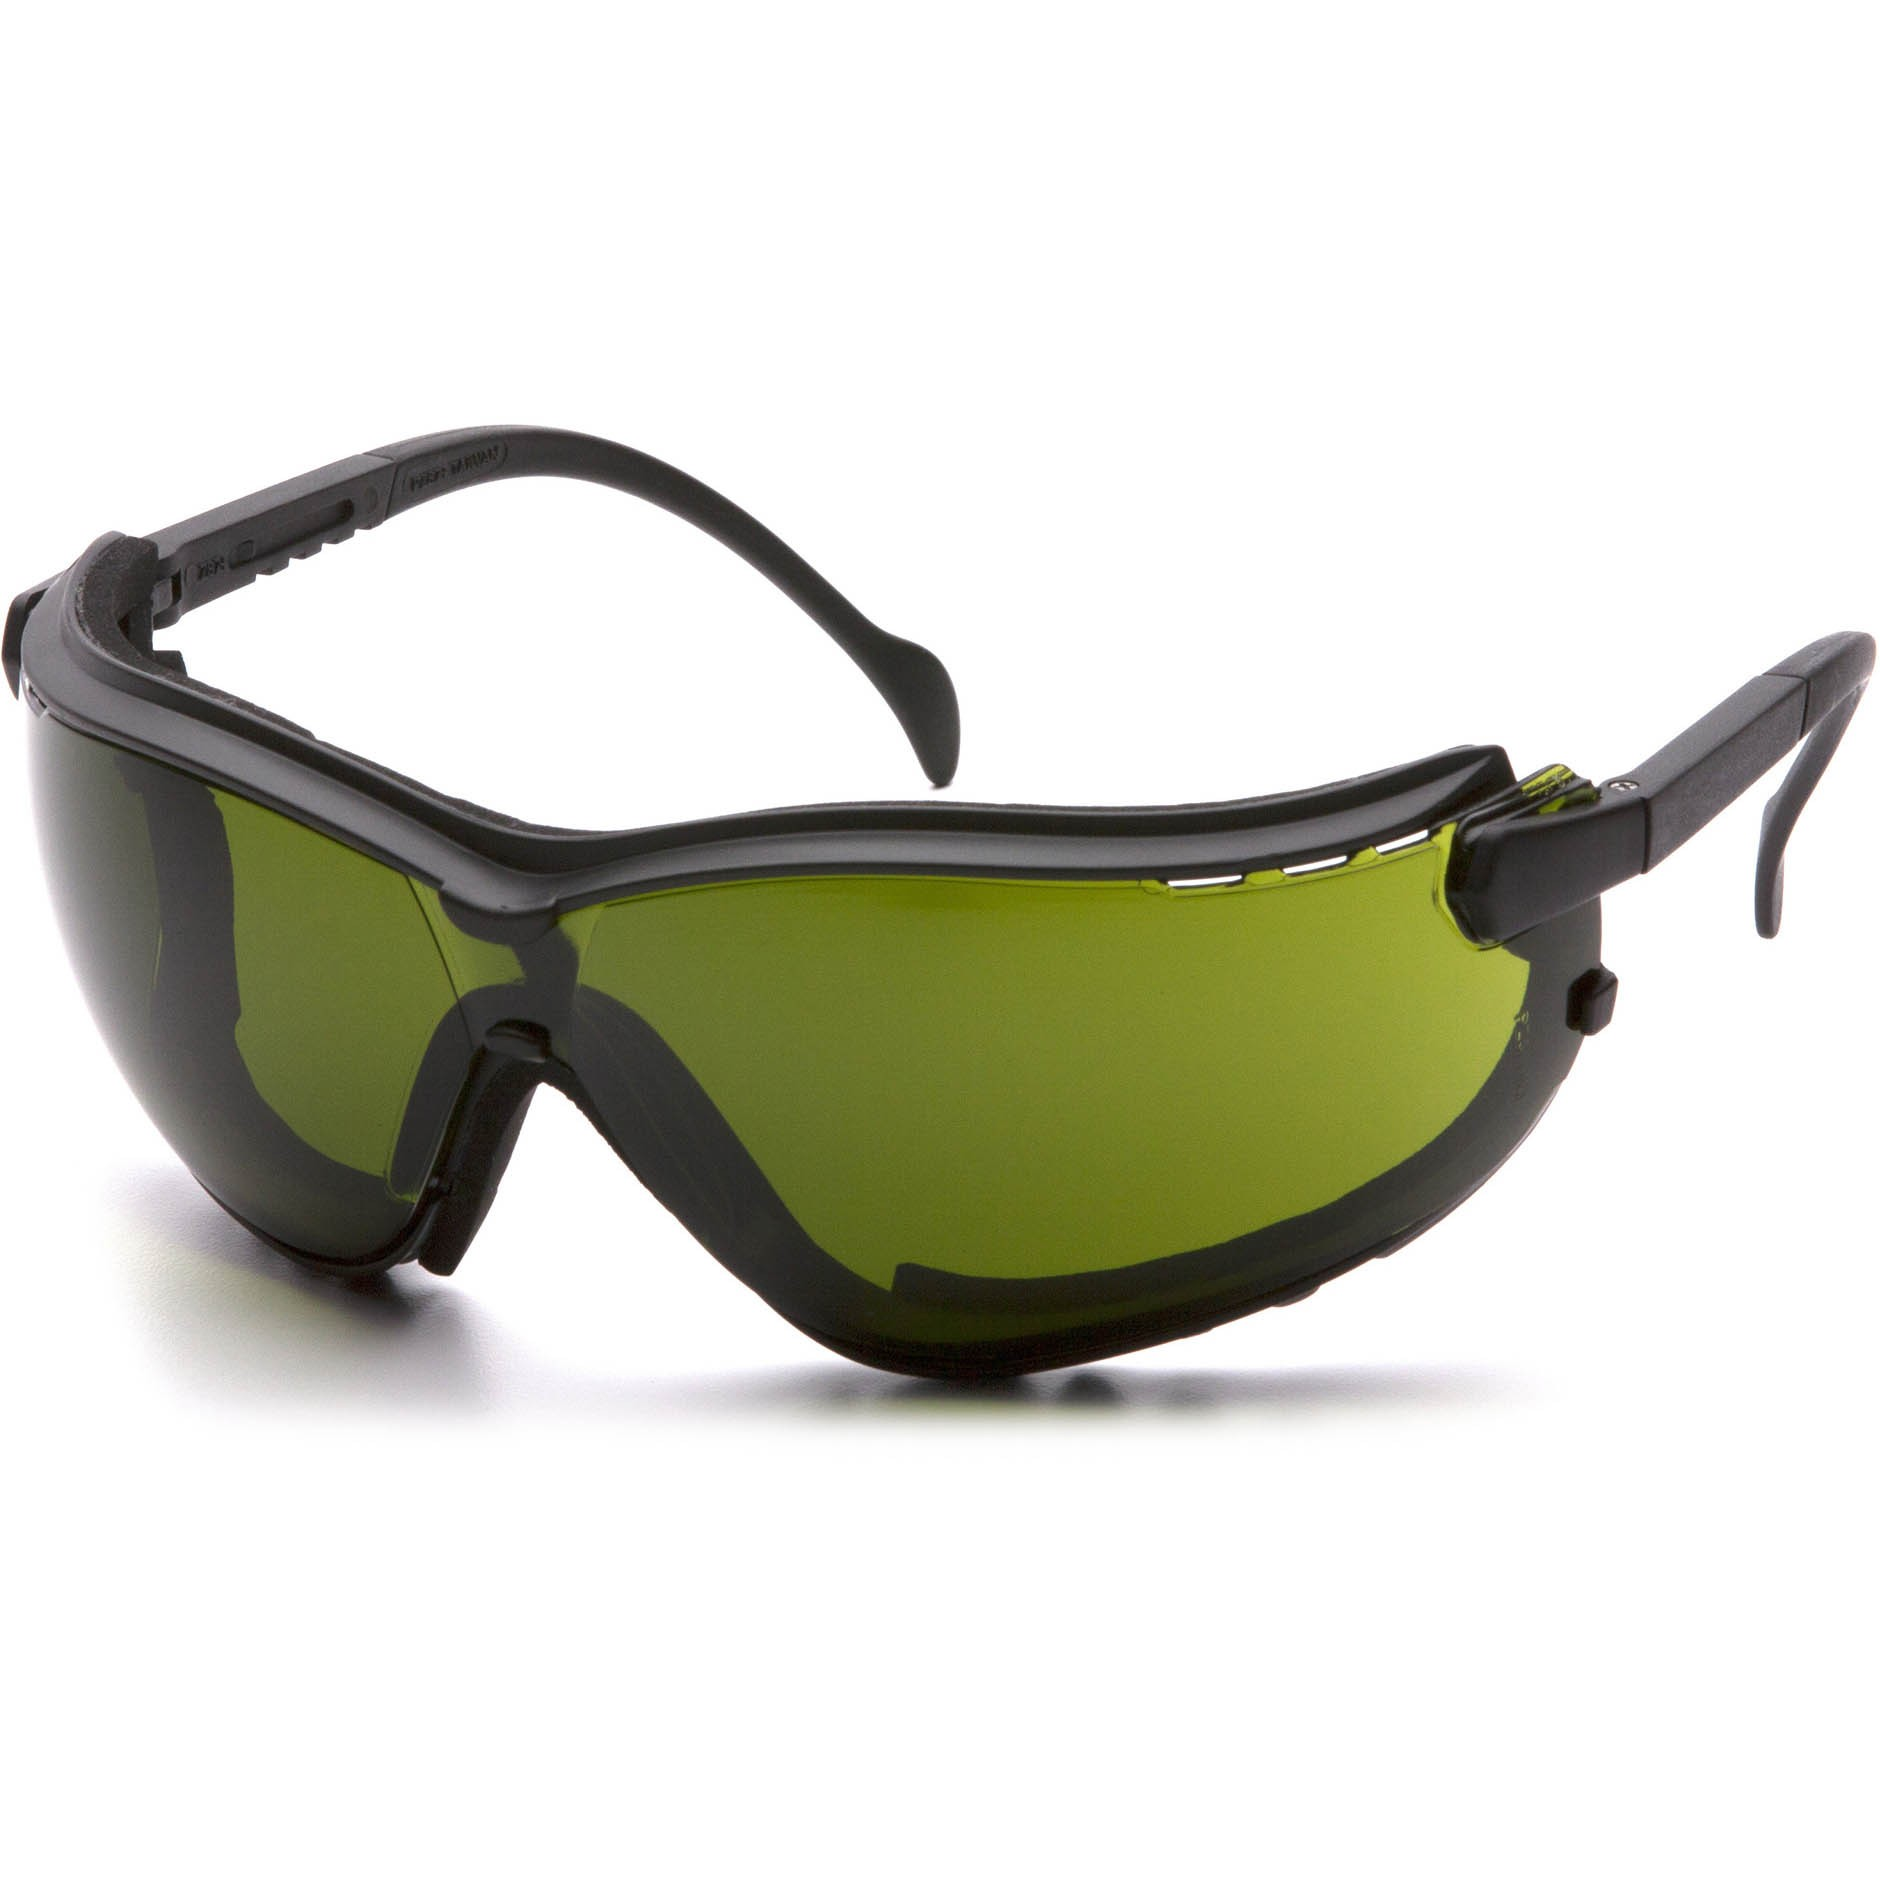 Pyramex V2g Safety Glasses Goggles Black Frame 3 0 Ir